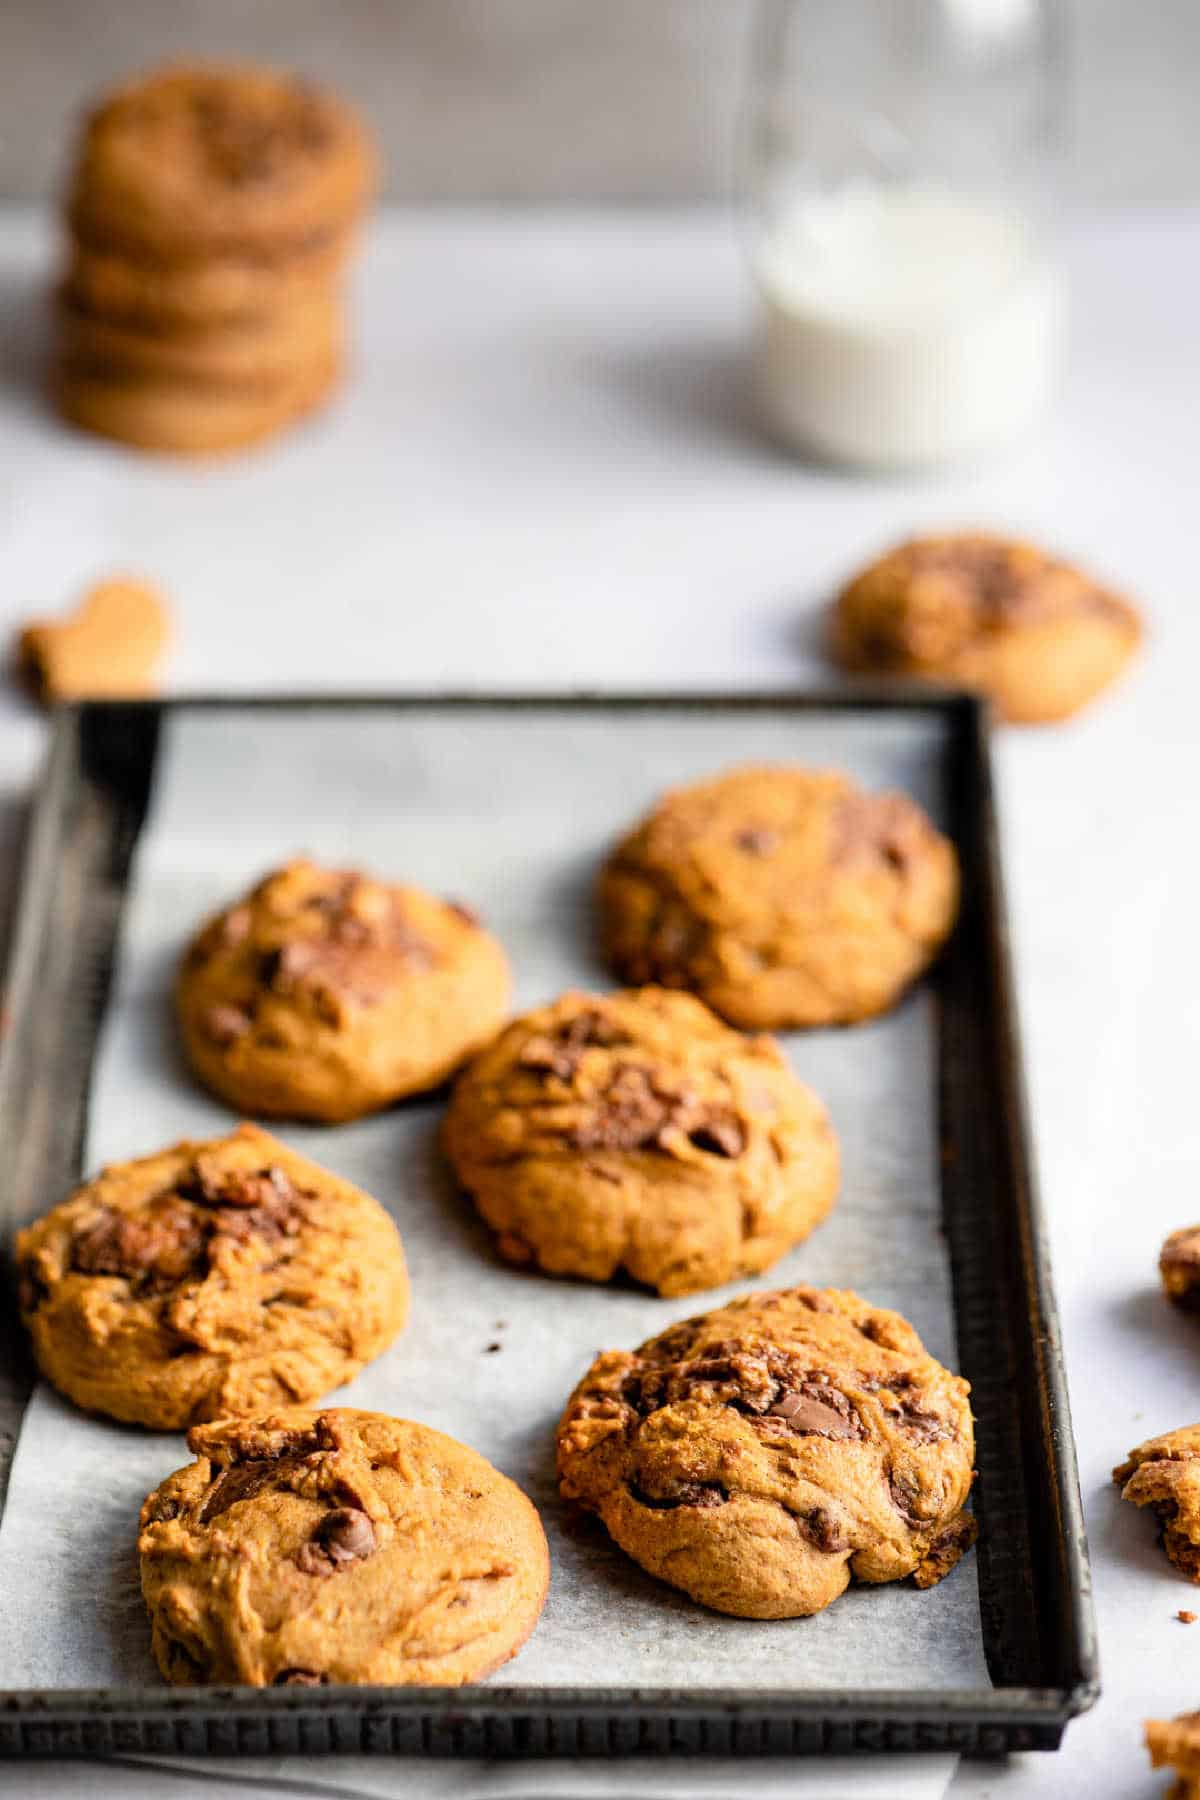 Pumpkin chocolate chip cookies on a baking sheet next to a glass of milk.